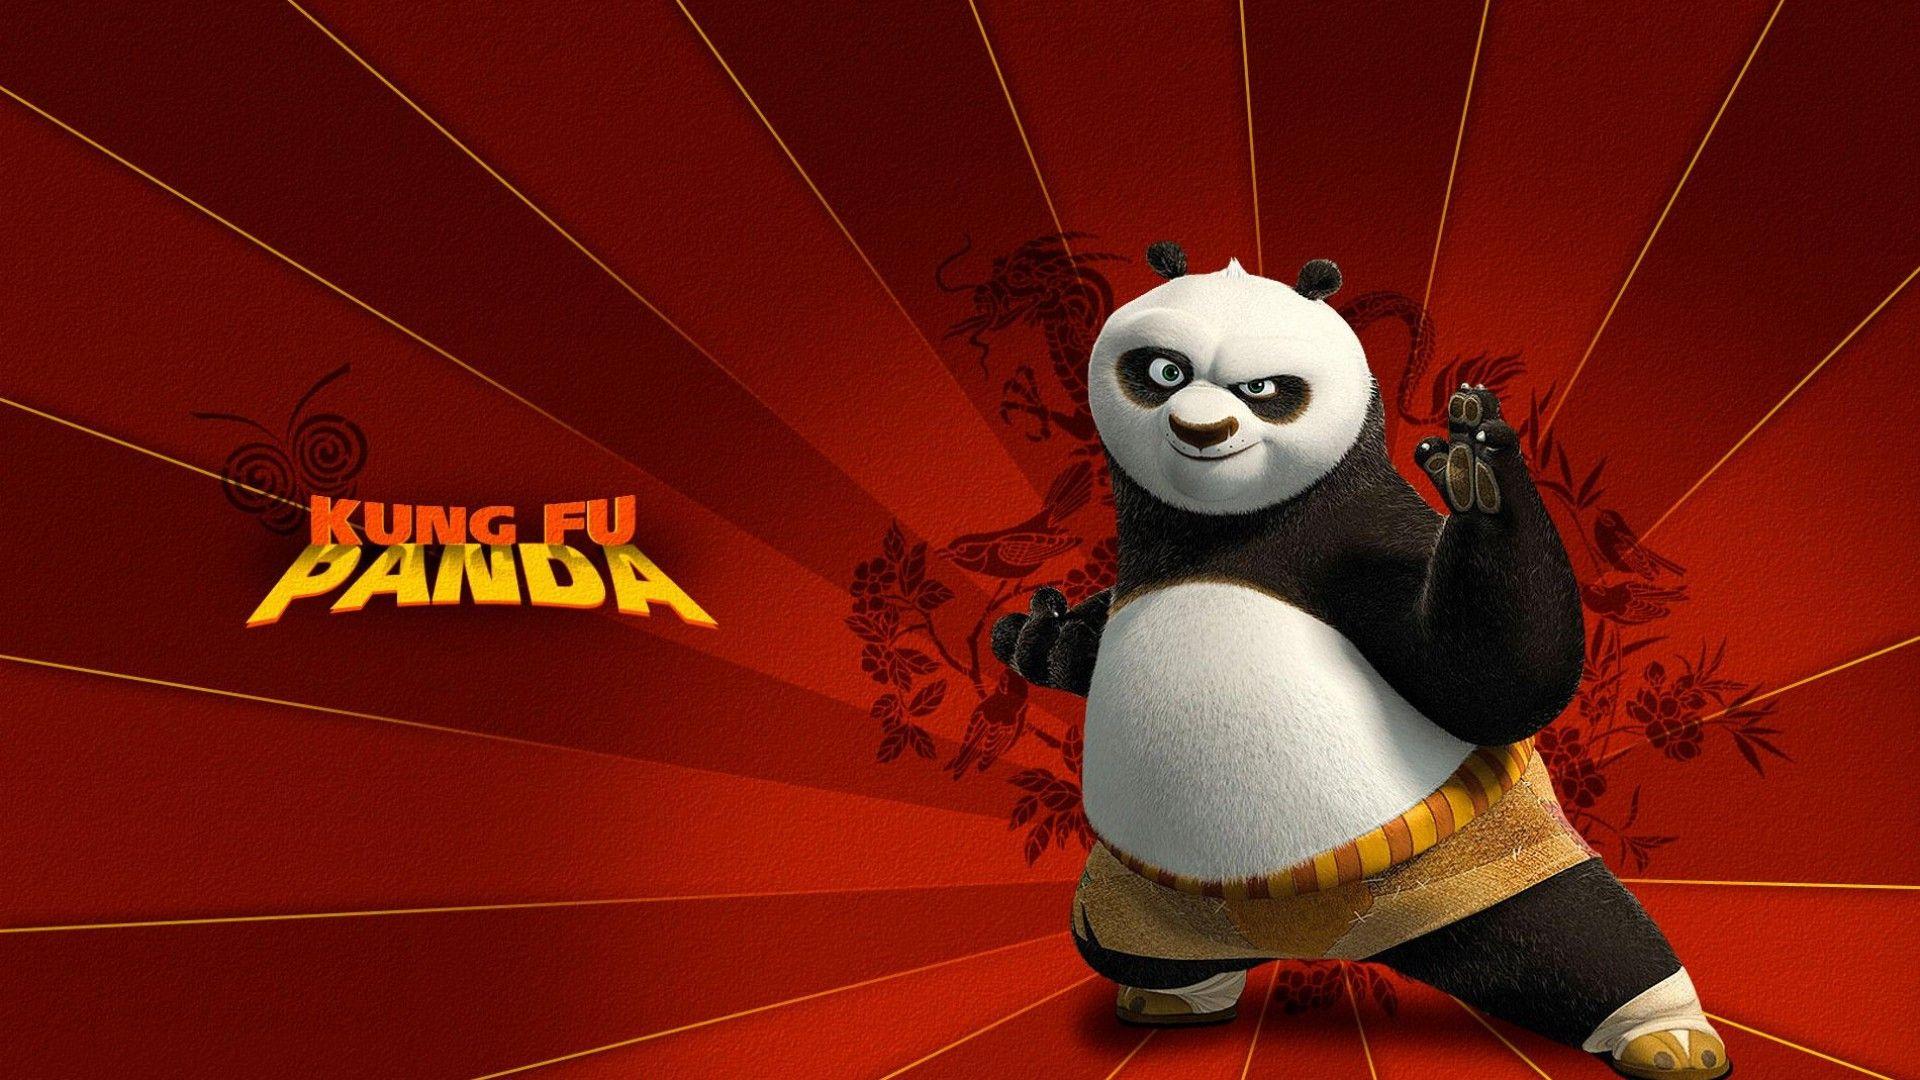 Hd screencaps from kung fu panda movie wallpapers 1920